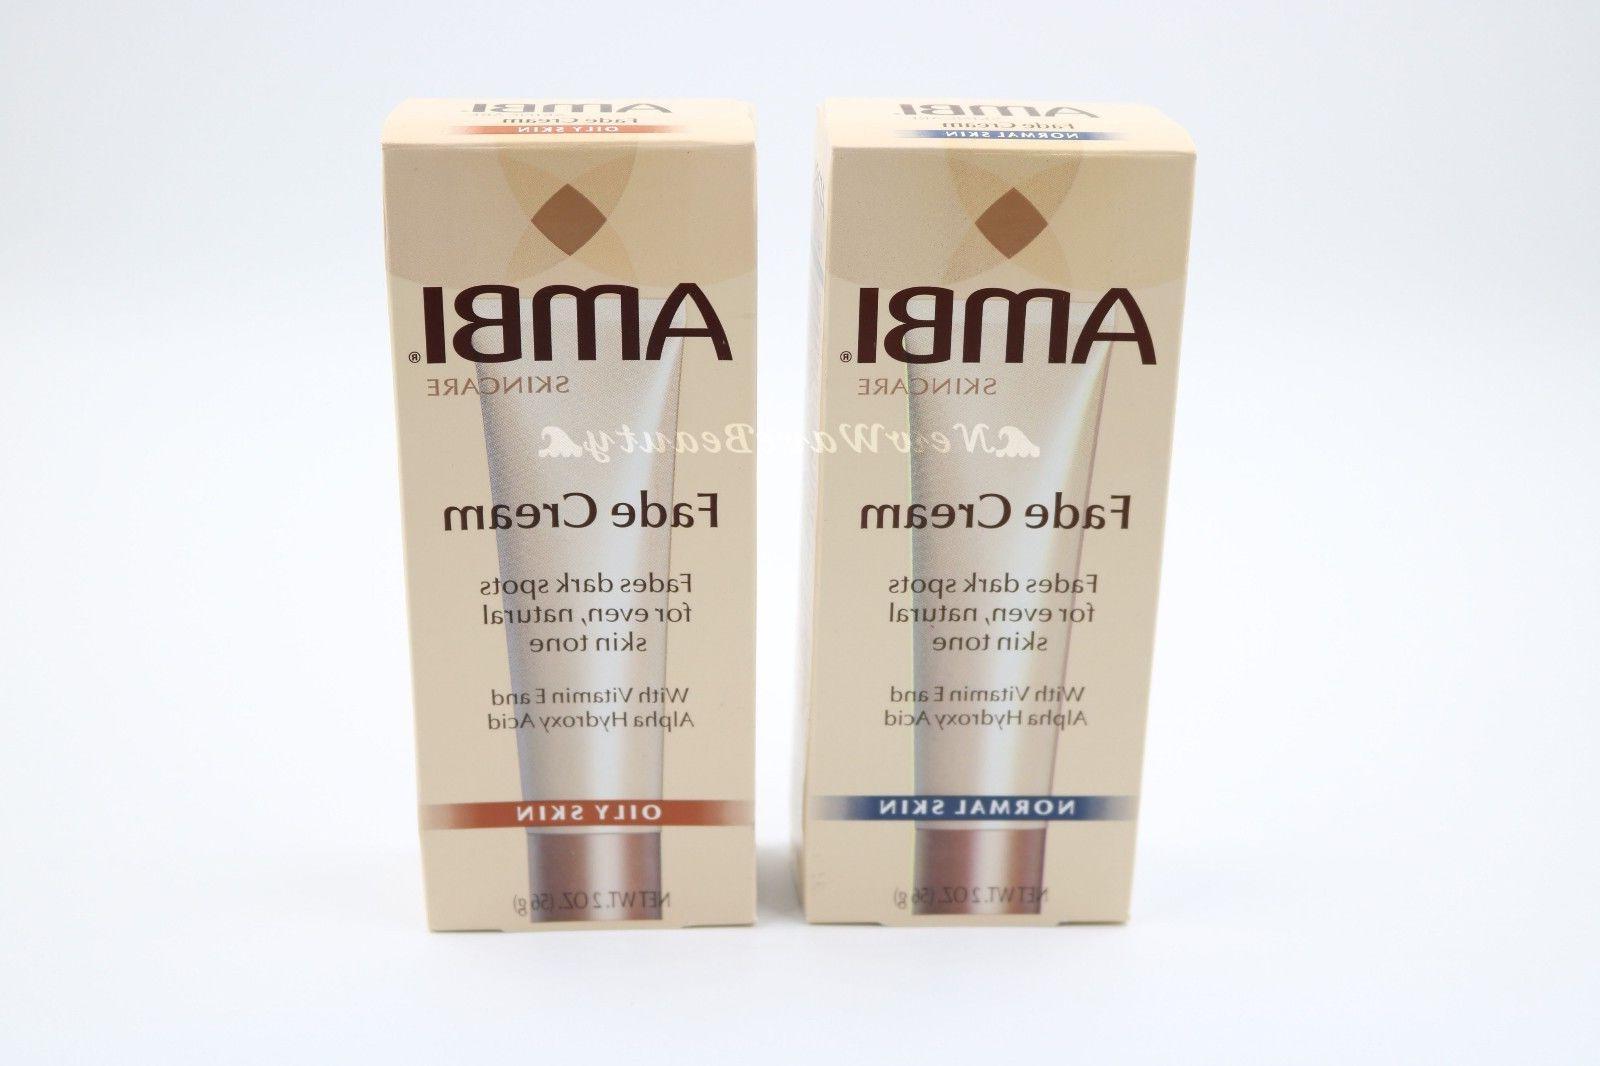 skincare fade cream 2oz available for 2